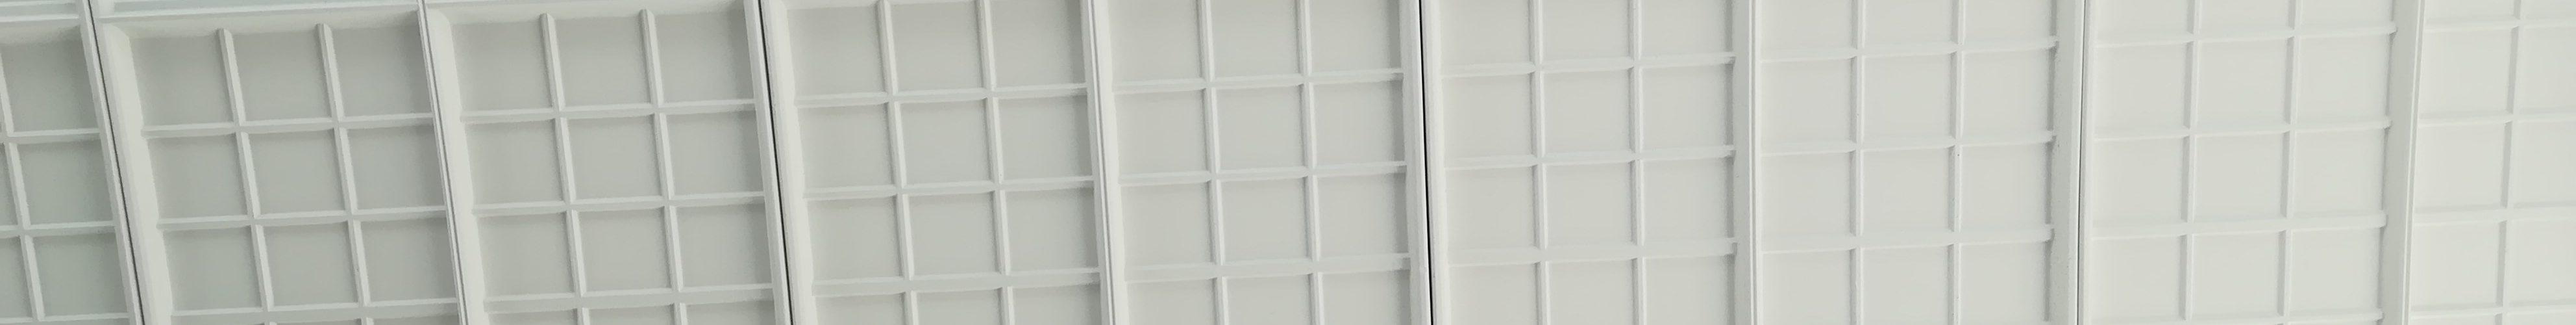 coppella di copertura in c.a.p.